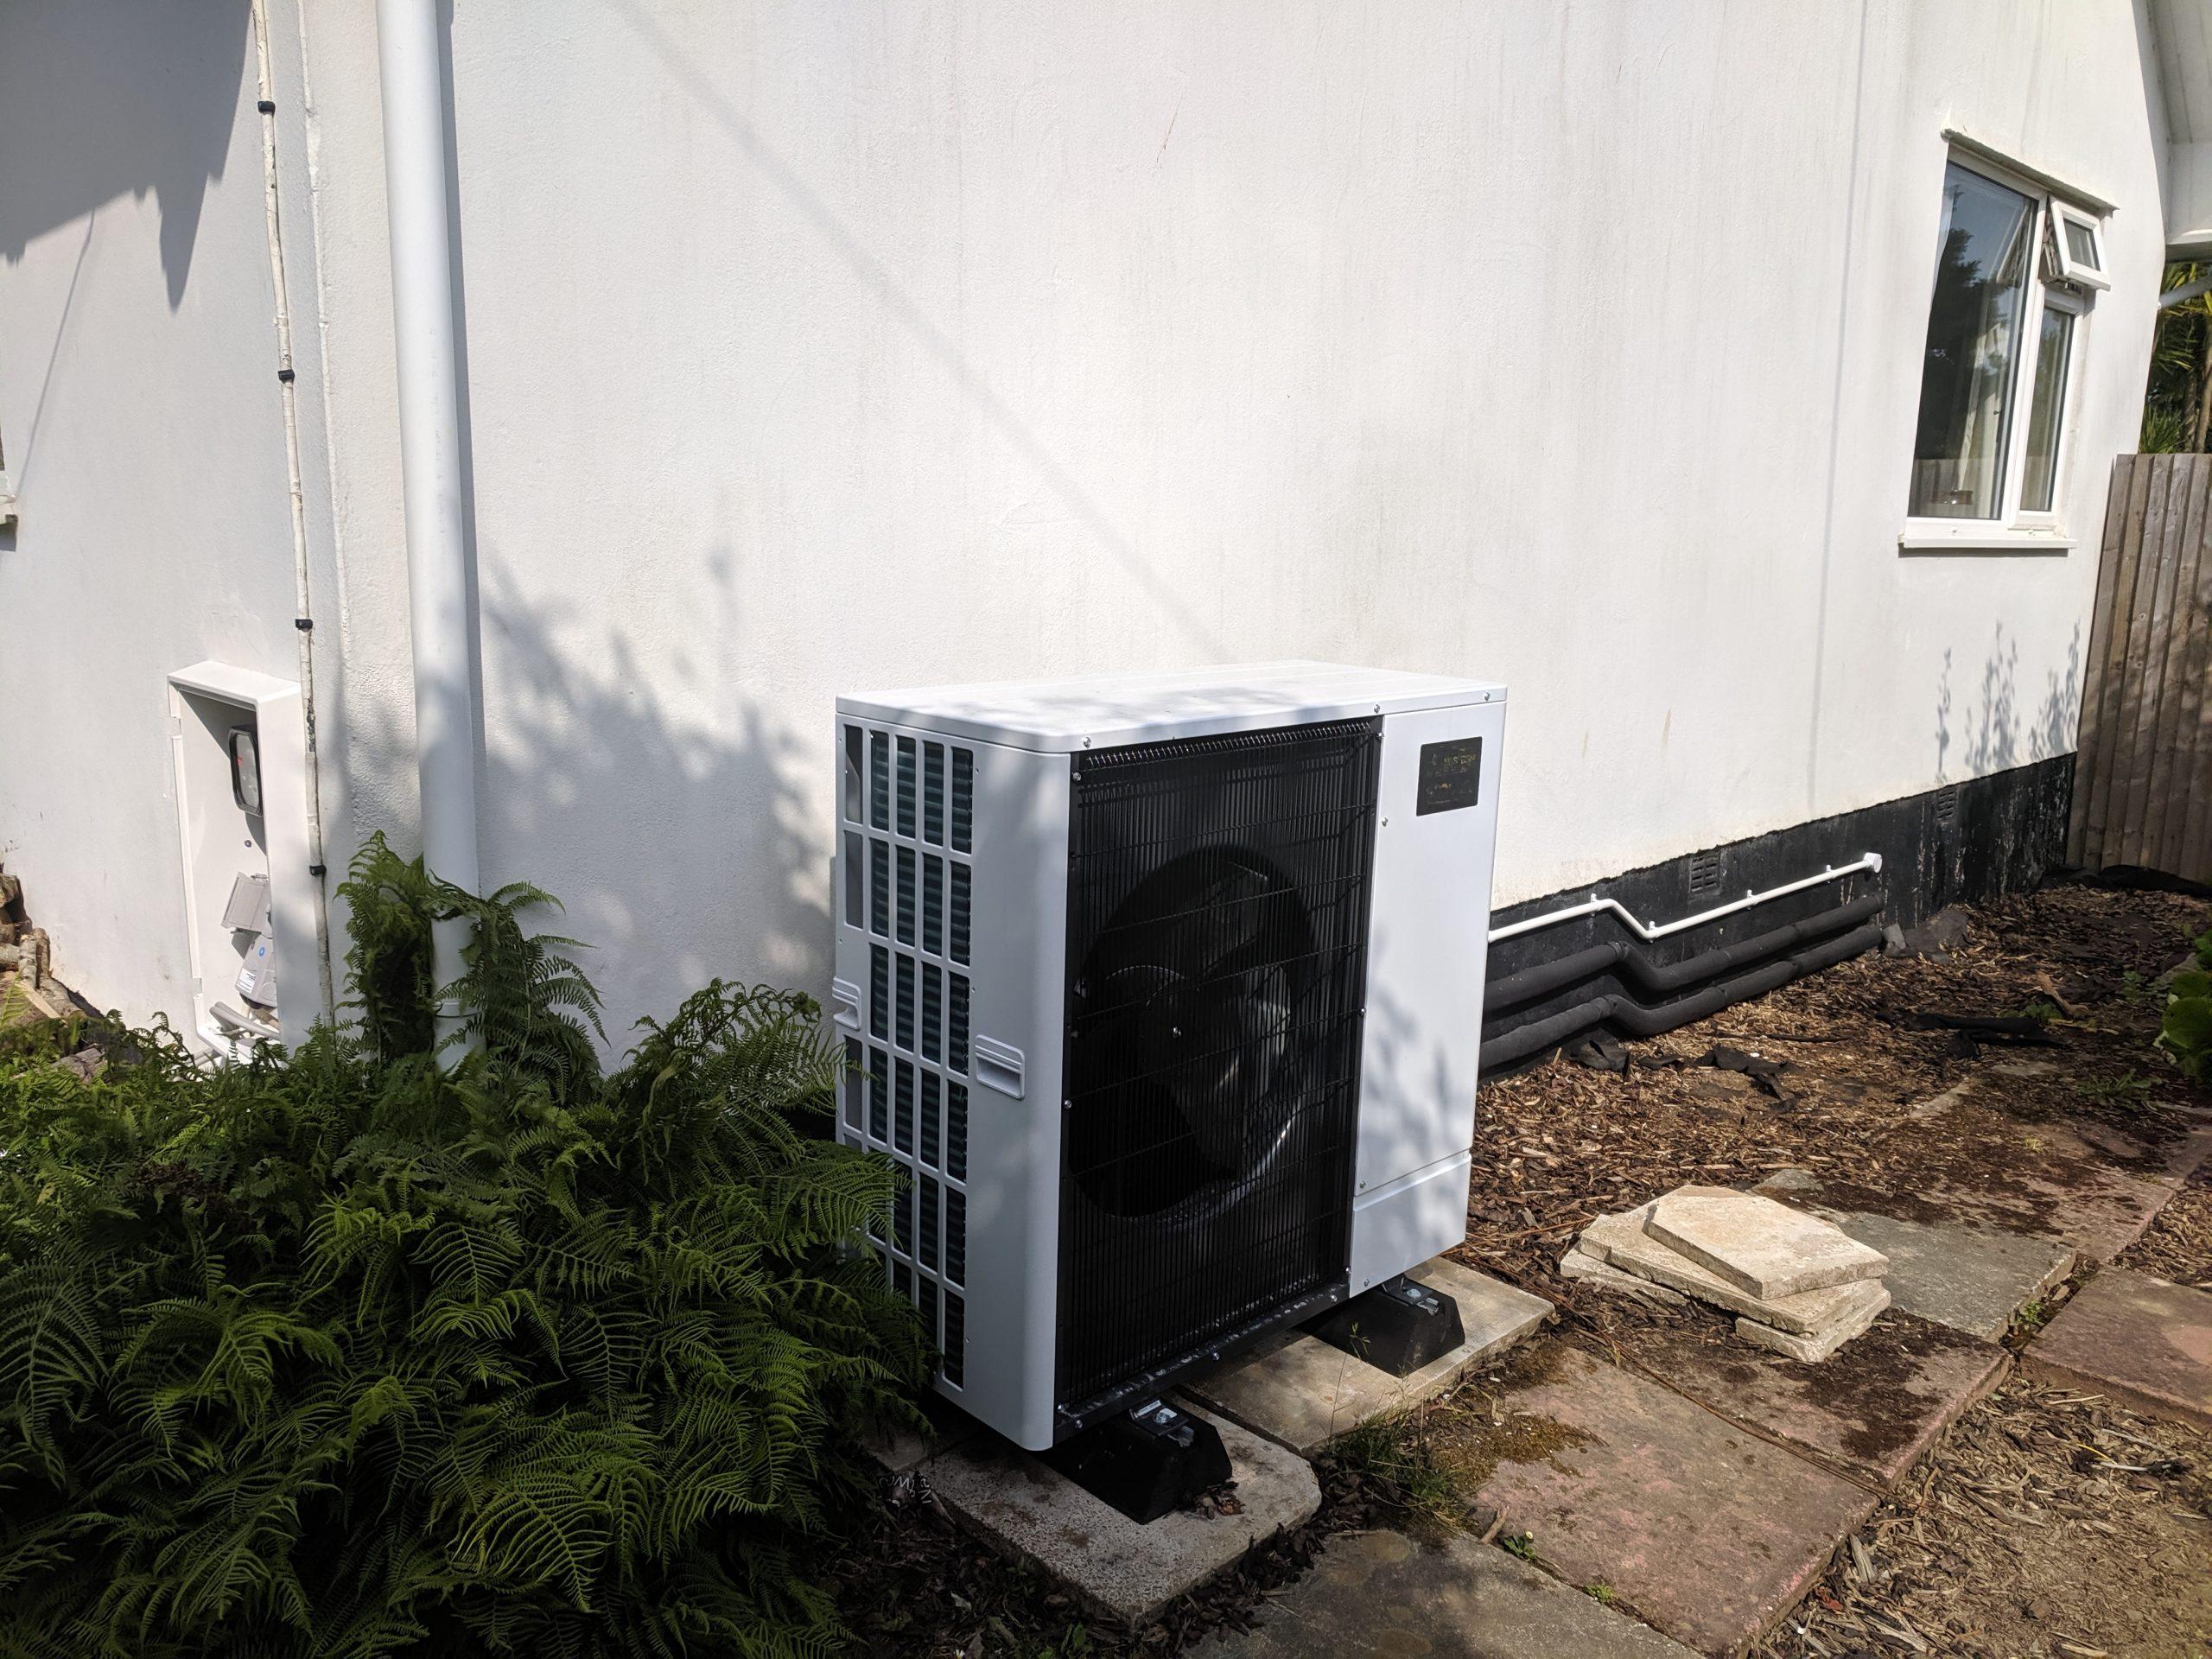 An Ultra Quiet Mitsubishi Ecodan air source heat pump installation in Hayle, Cornwall.